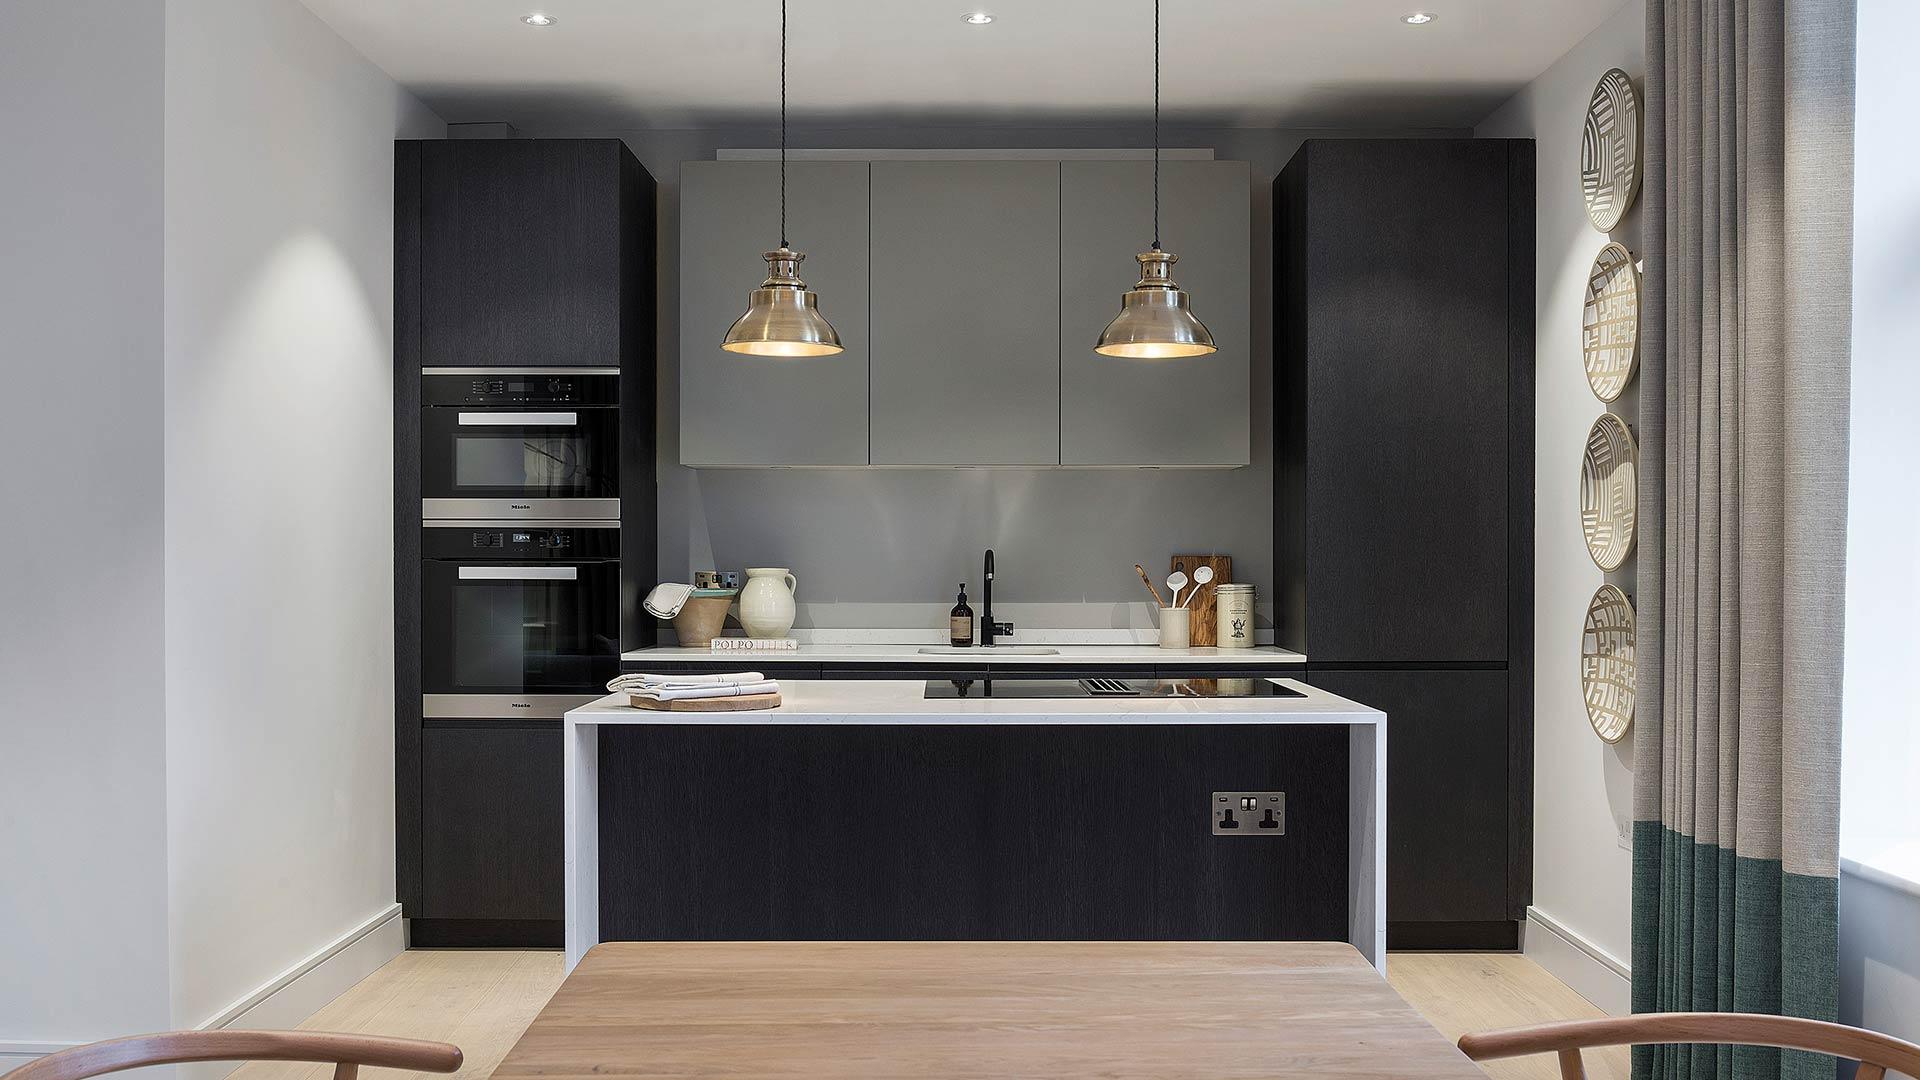 Cucina con isola_Londra 1